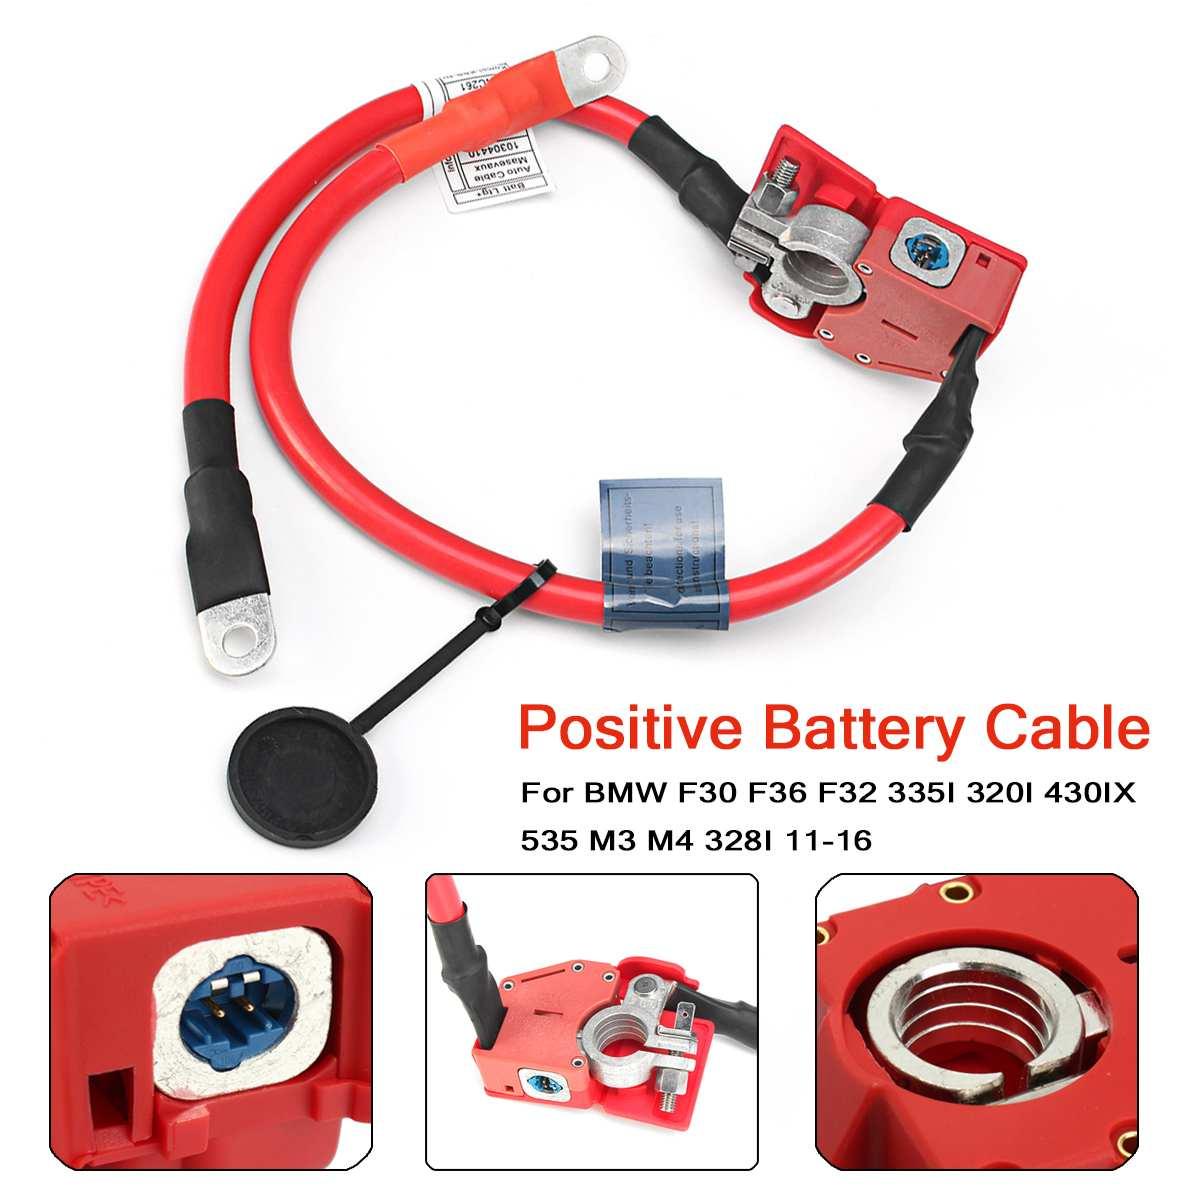 Batterij Overbelasting Protector Kabel Wire Terminal 61129259425 61126834543 Voor BMW F30 F36 F32 335I 320I 430IX 535 M3 M4 11 -16